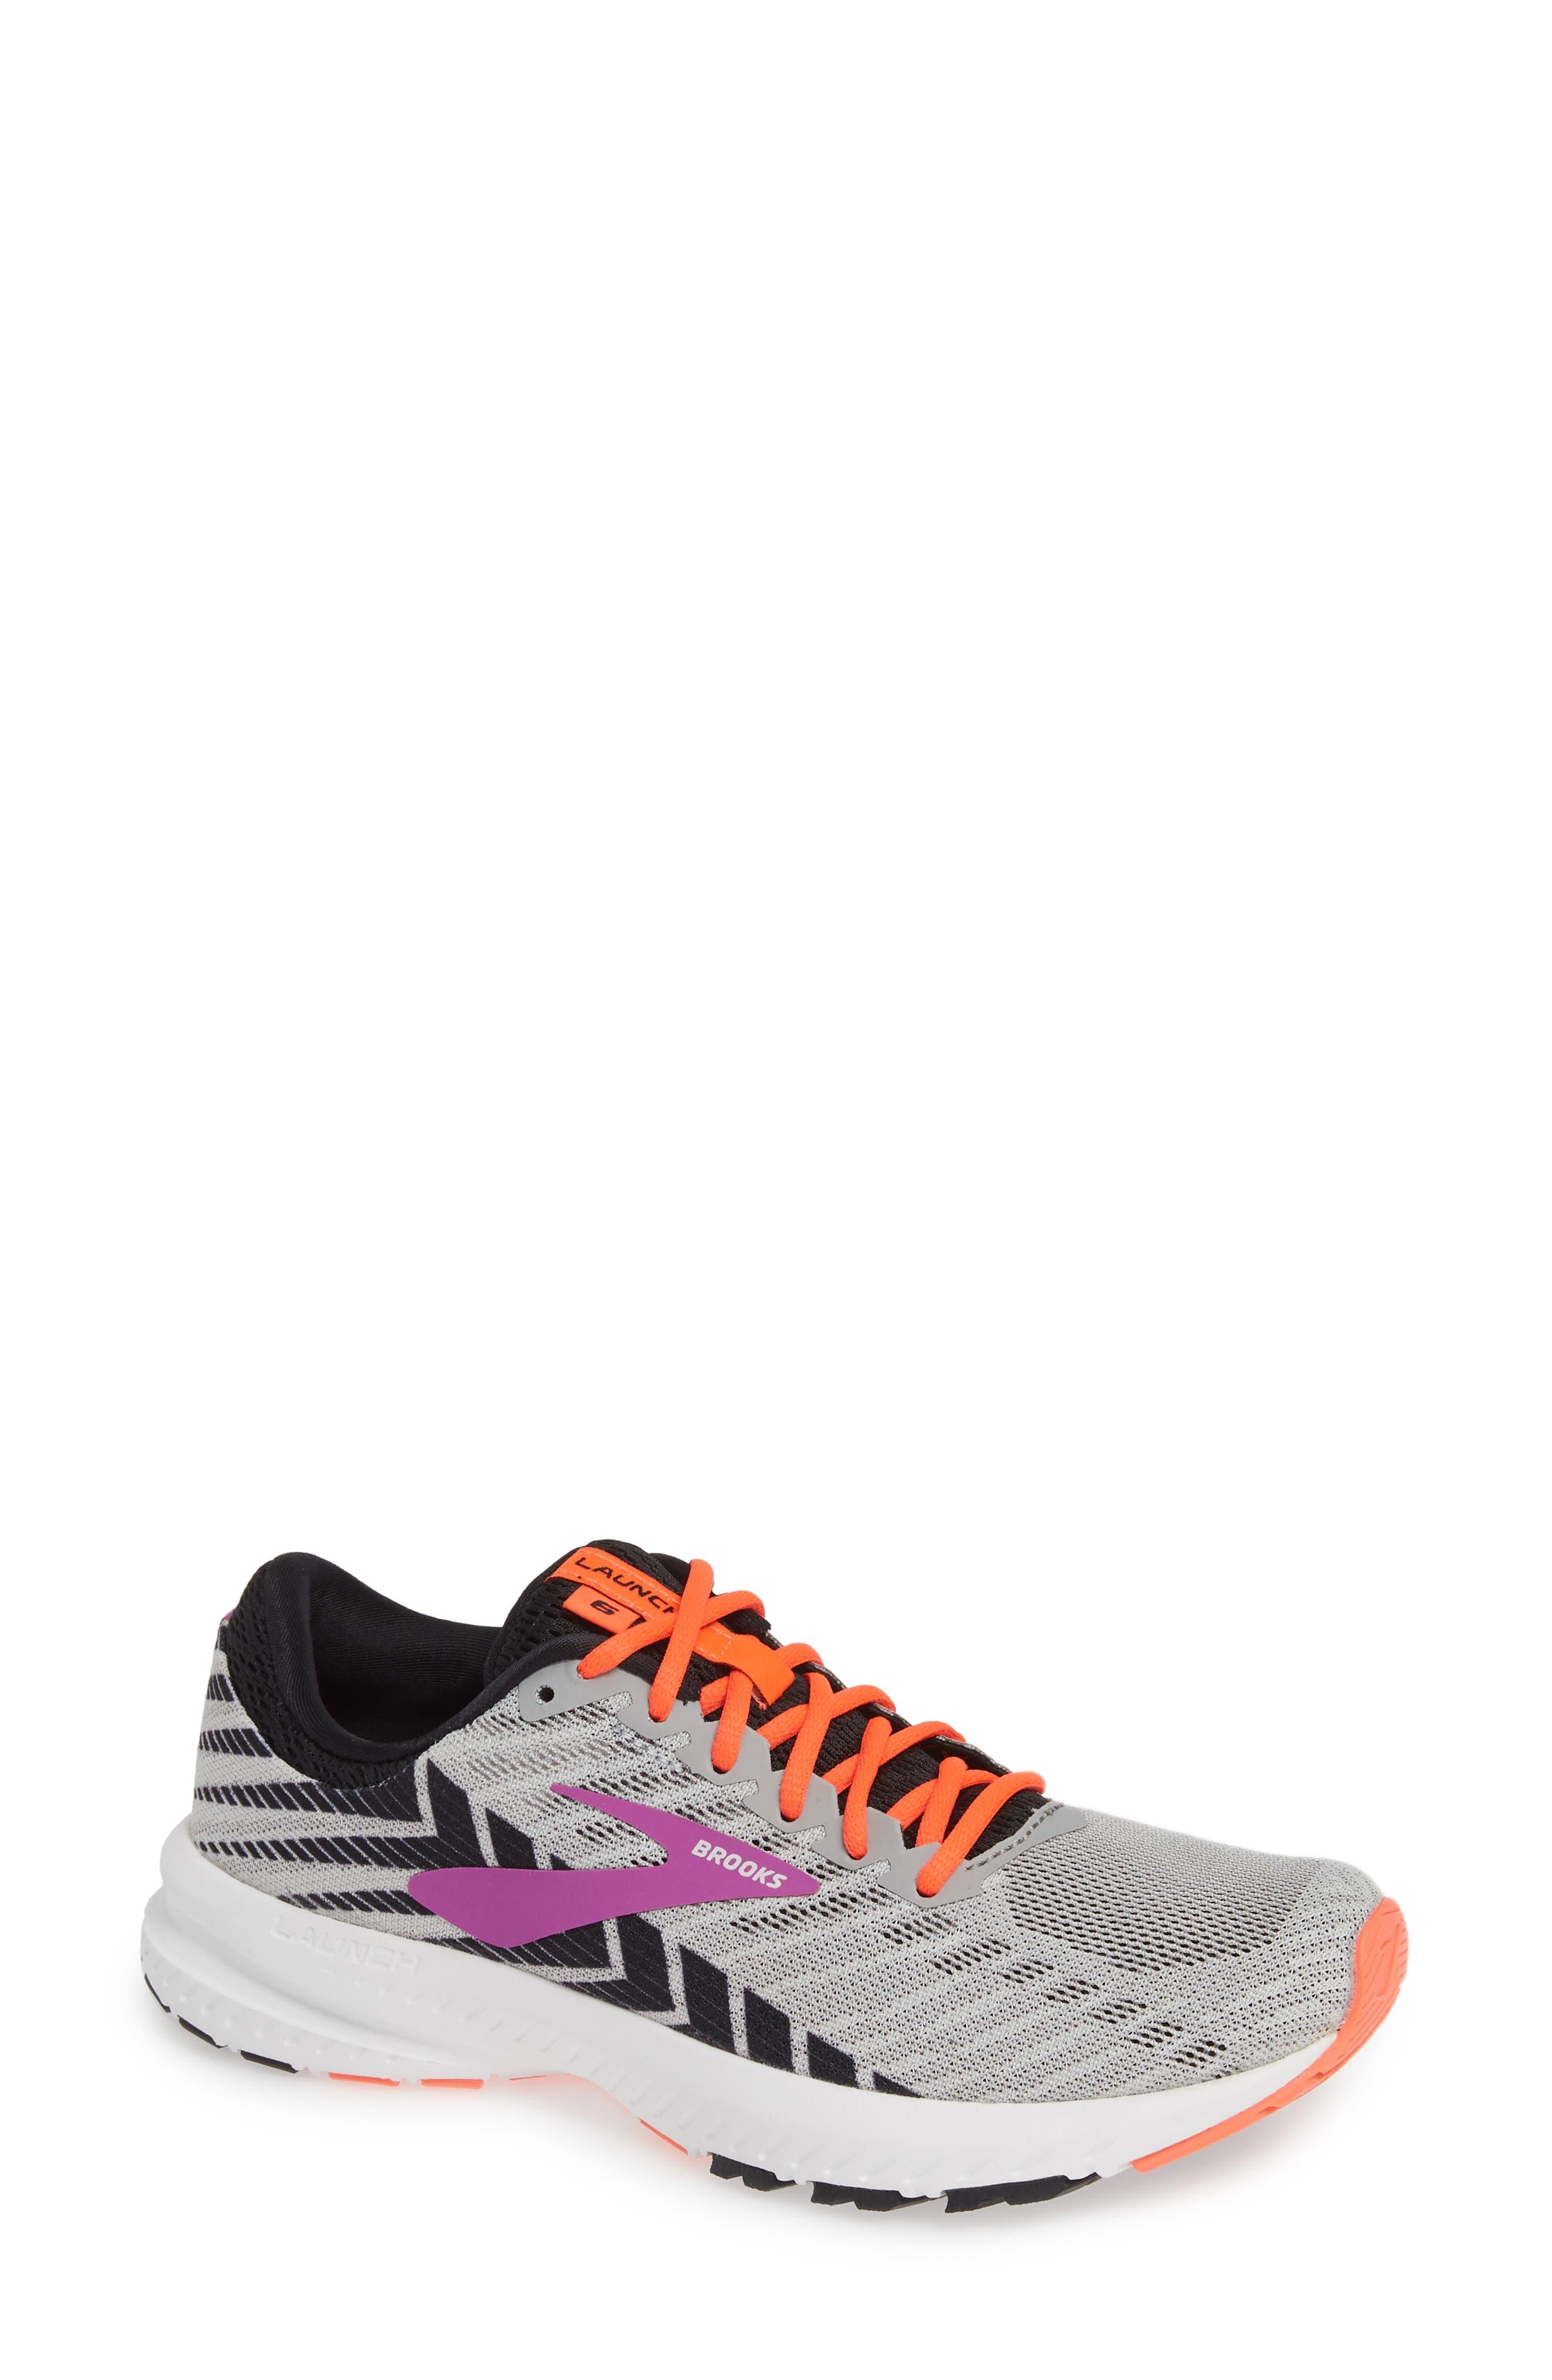 Launch 6 Running Shoe, Main, color, GREY/ BLACK/ PURPLE